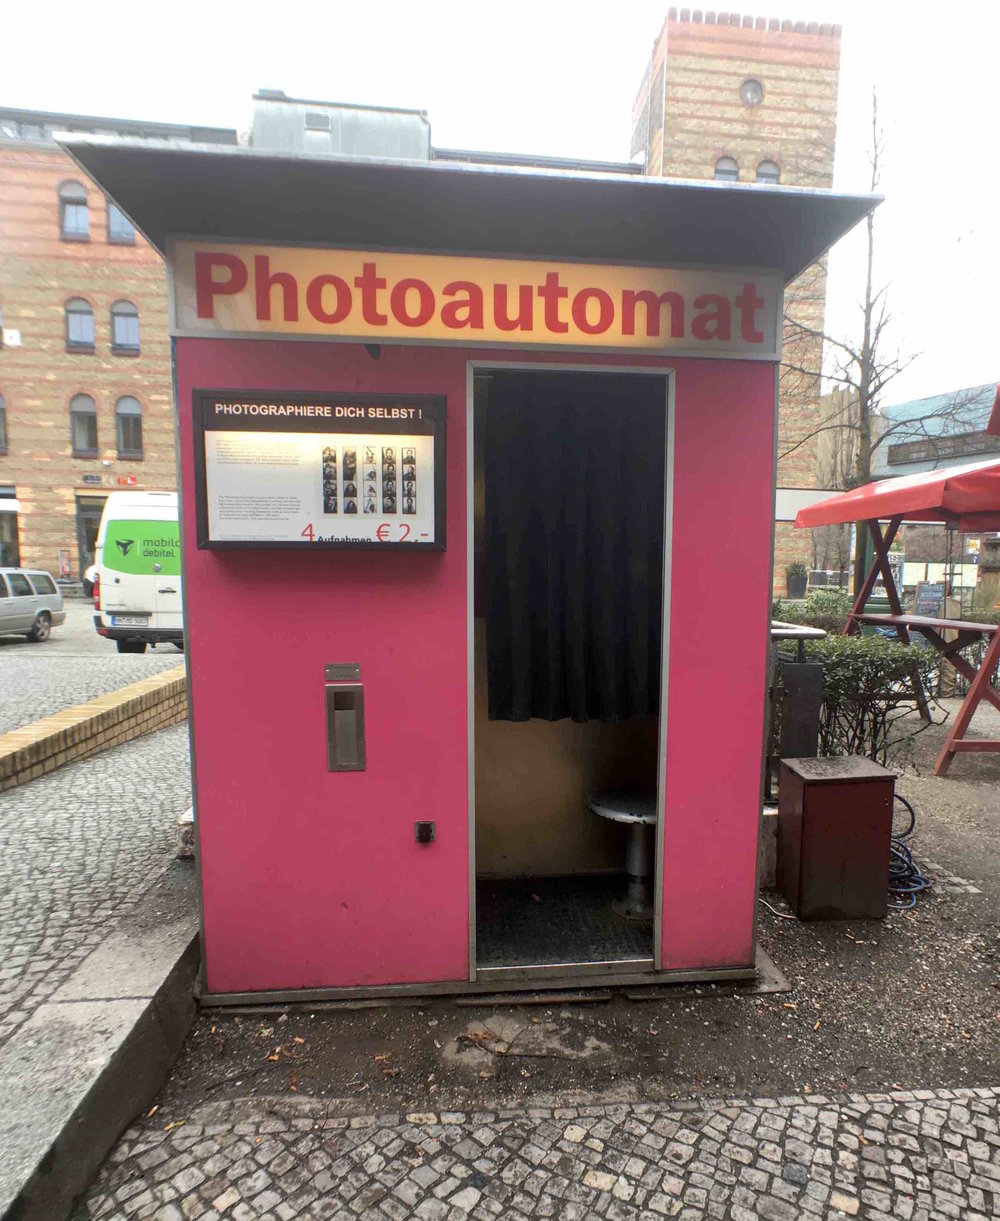 hoiberlin-photoautomat-4.jpg